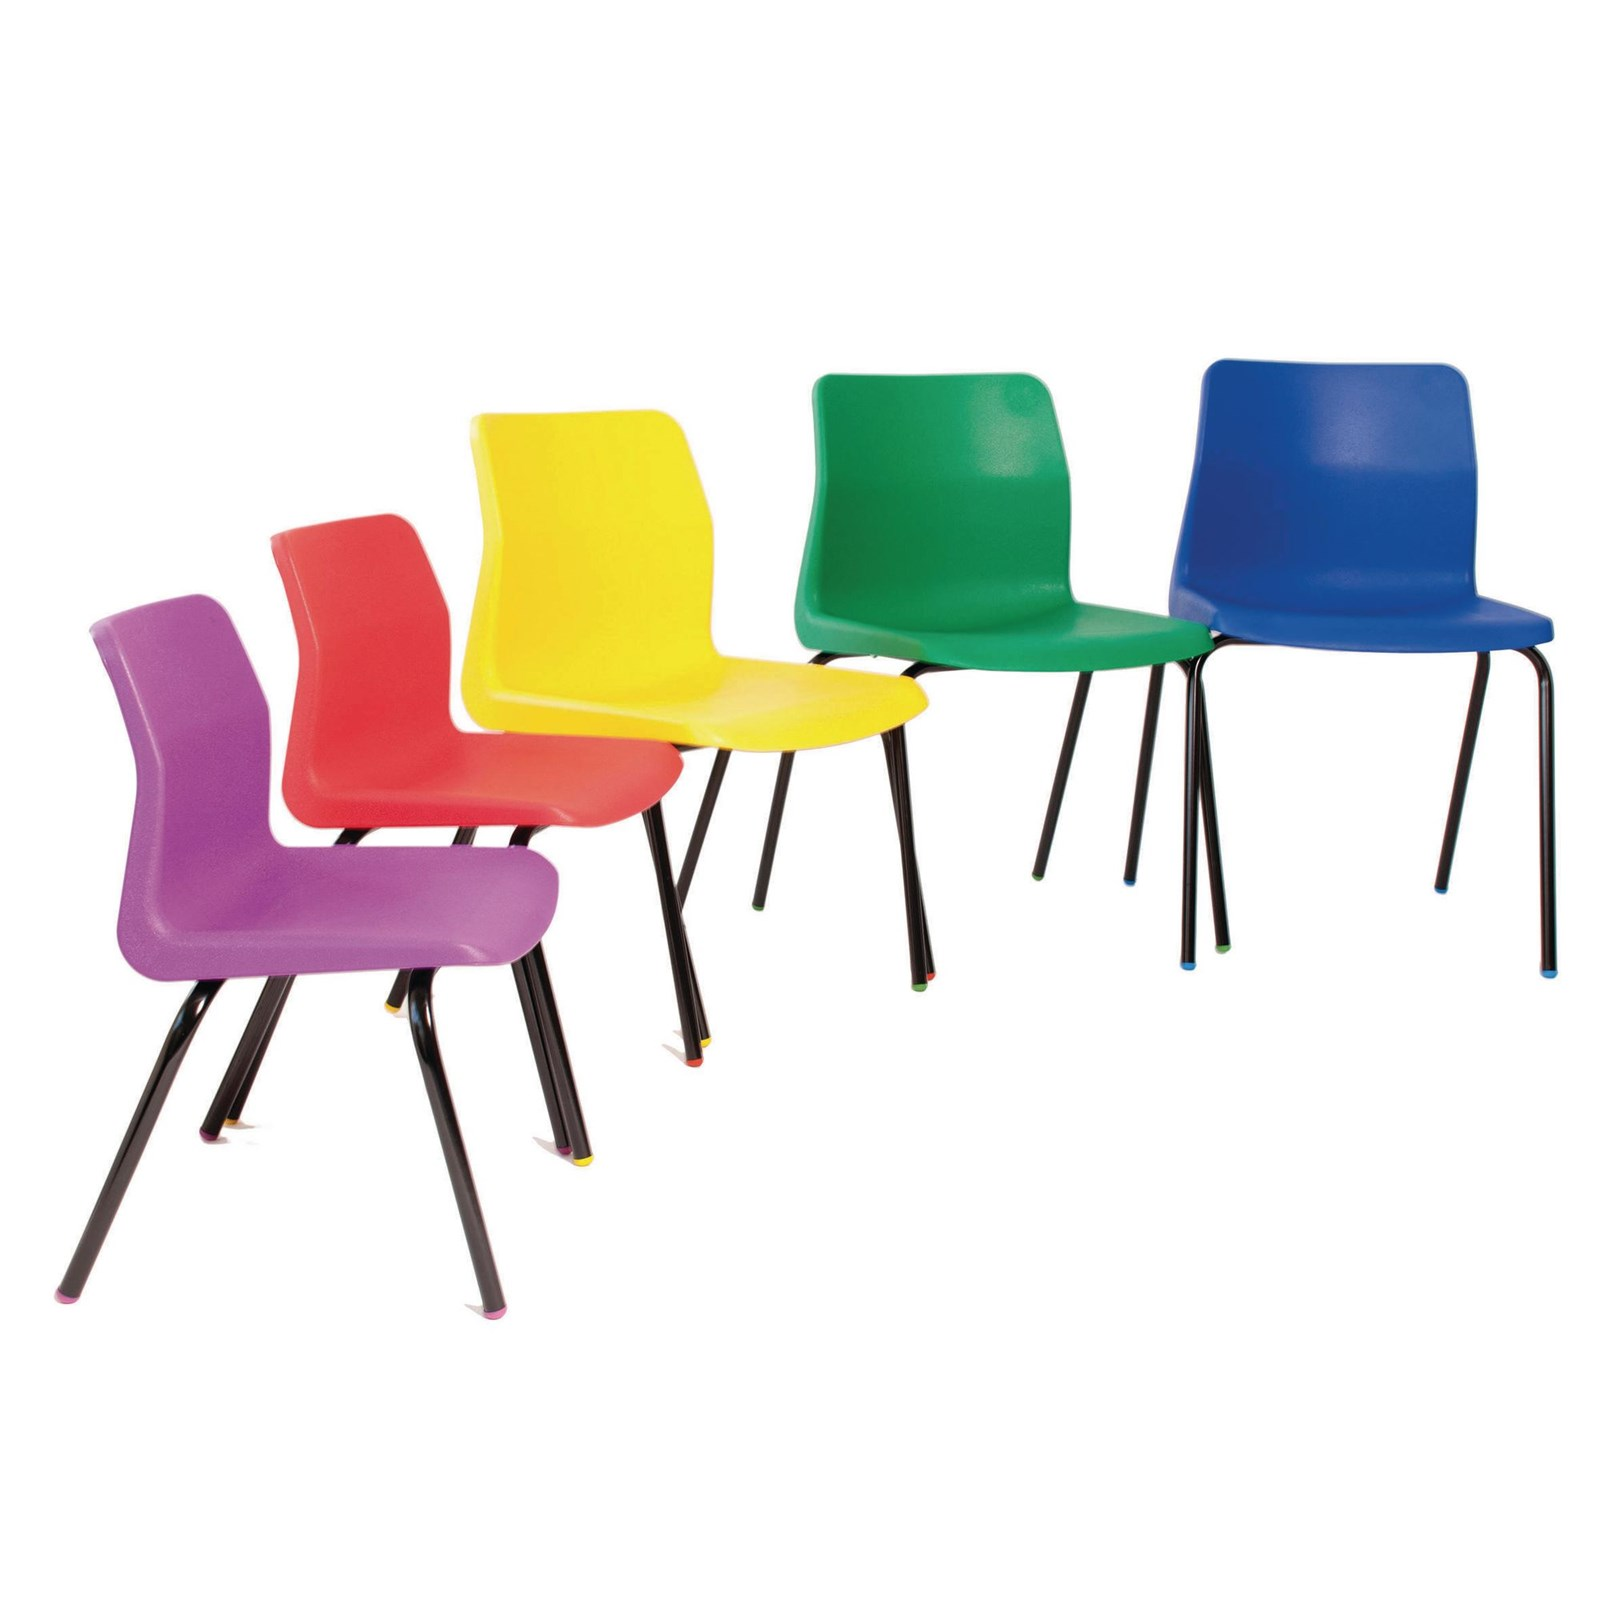 P6 Chair 260mm Blk Frm Brwn